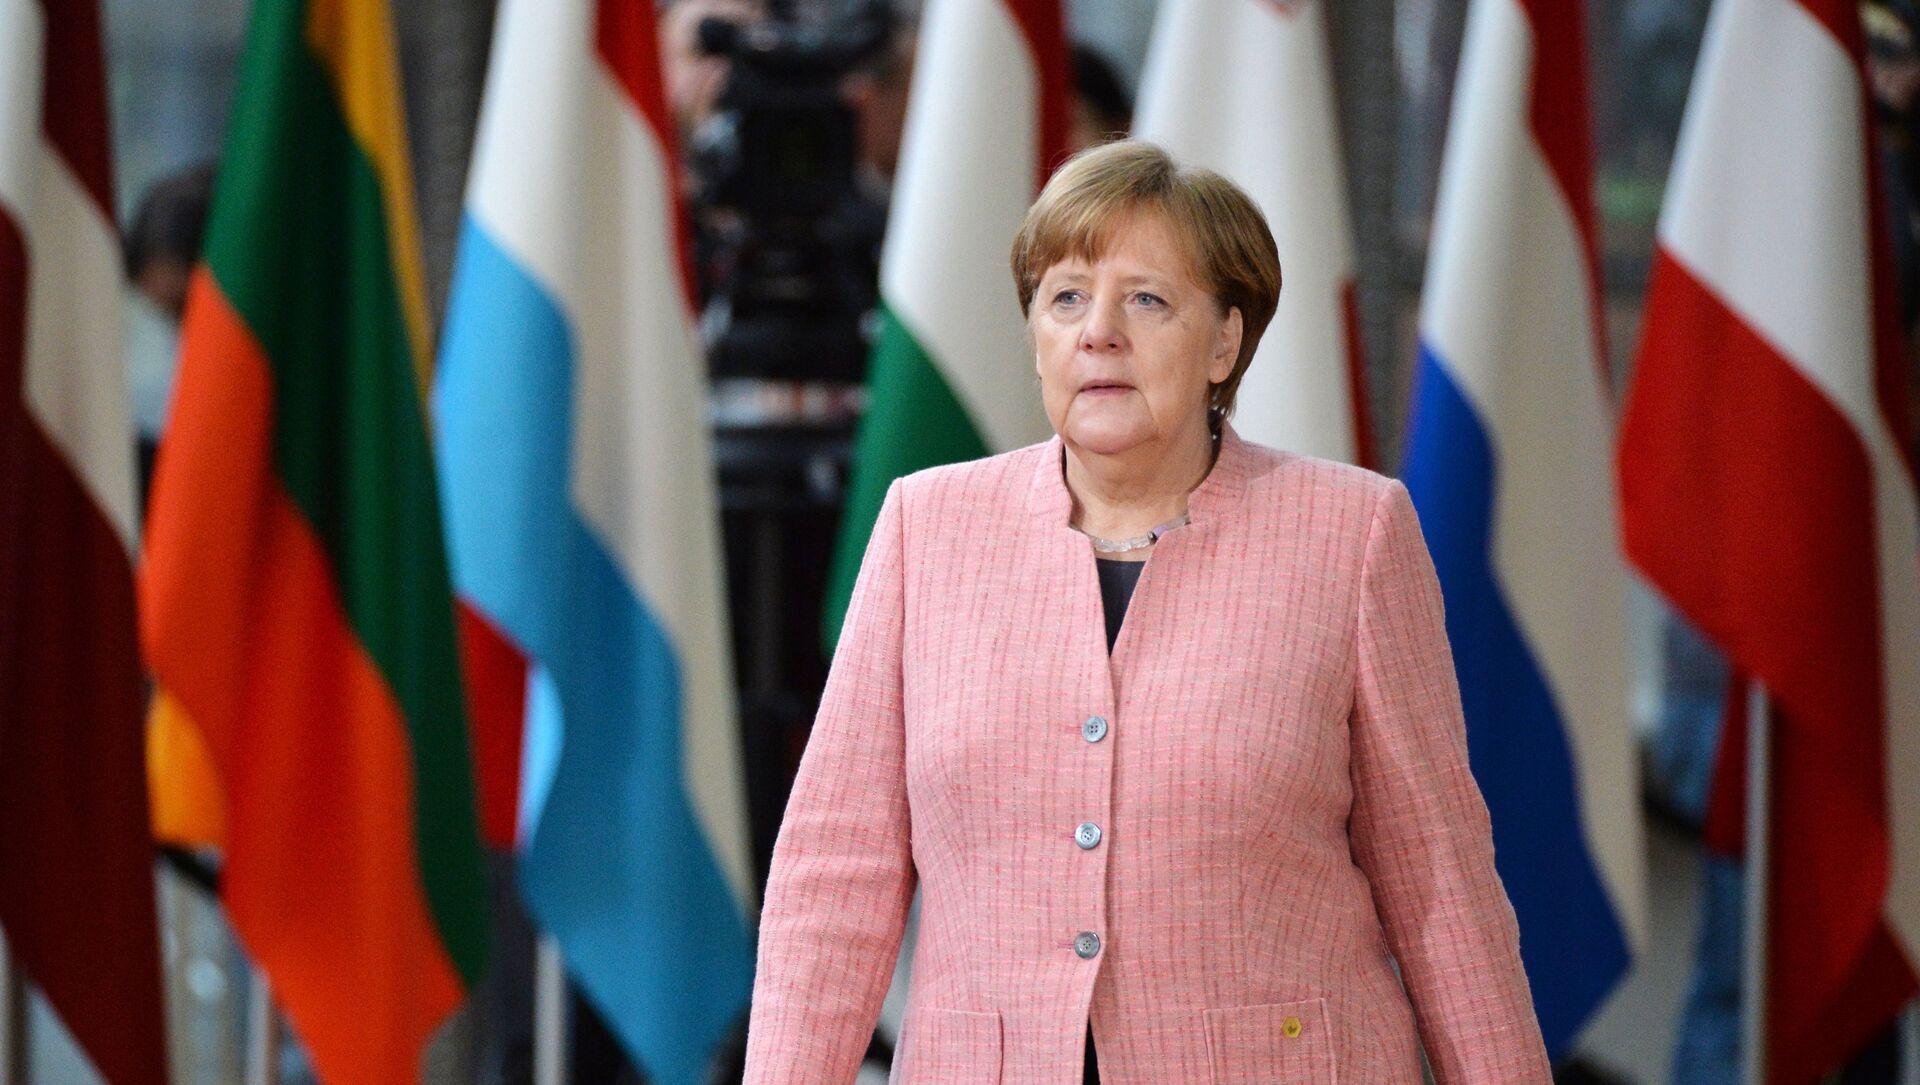 Il cancelliere tedesco Angela Merkel - Sputnik Italia, 1920, 25.04.2021